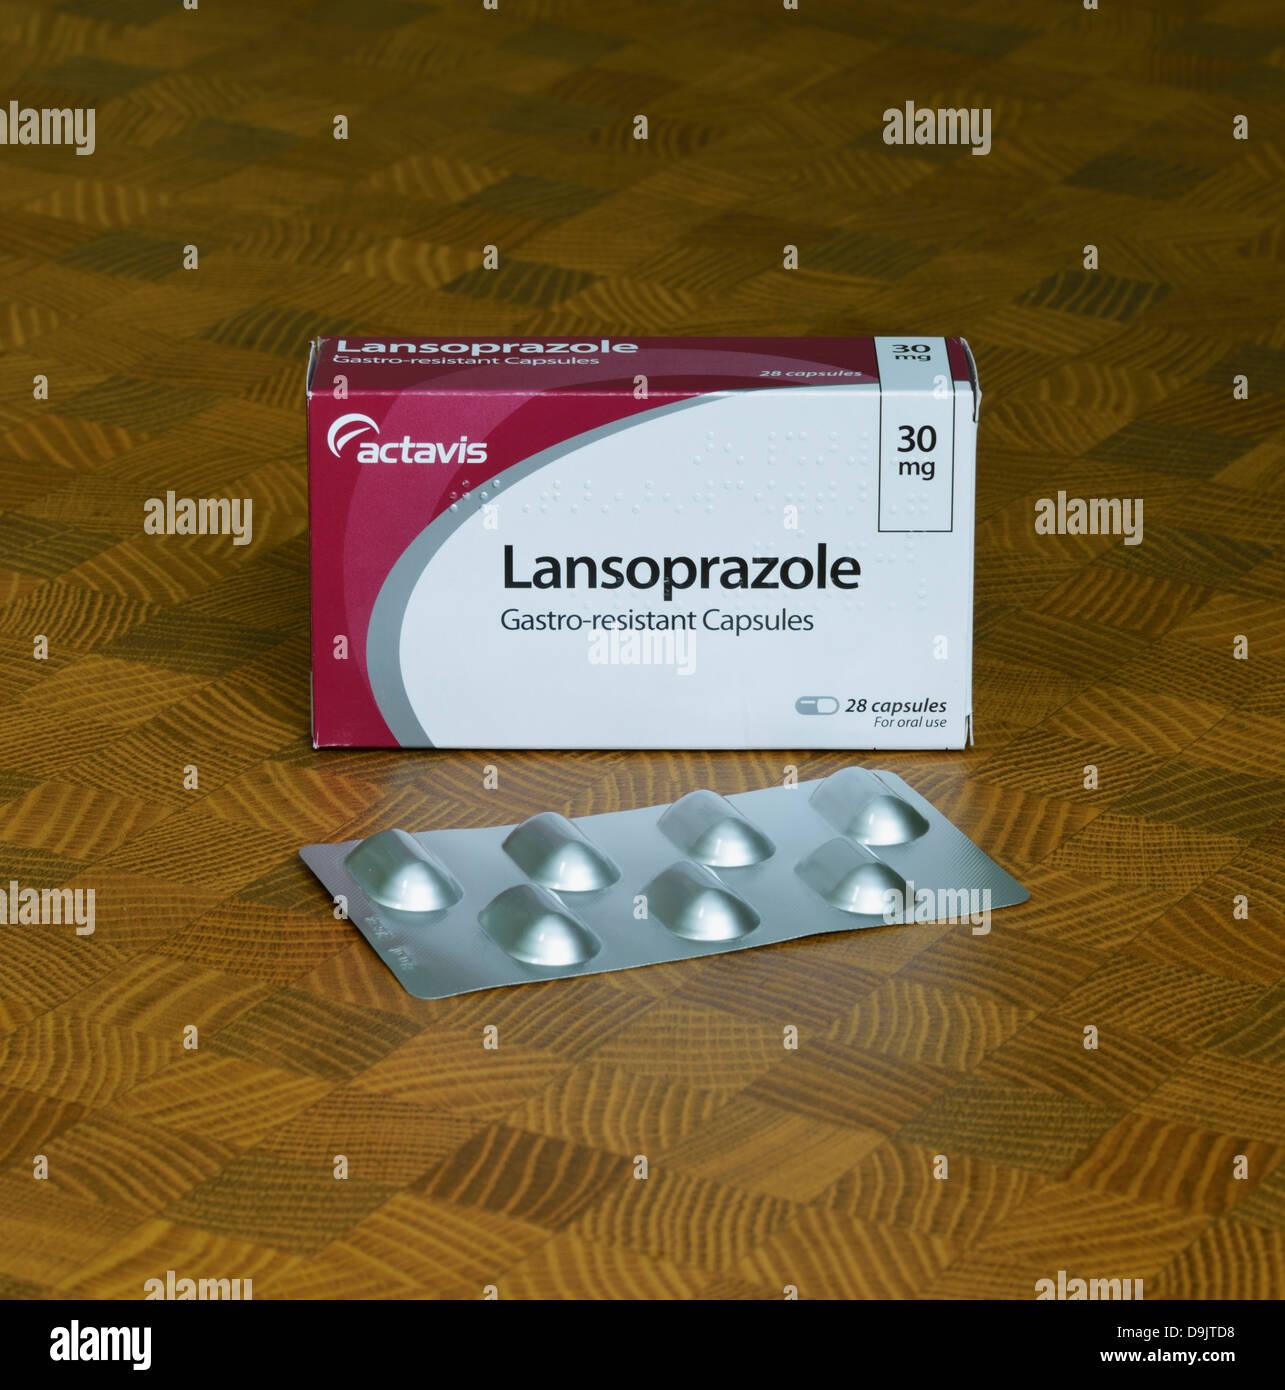 lansoprazole-gastro-resistant-capsules-30mg-28-capsules-for-oral-use-D9JTD8.jpg